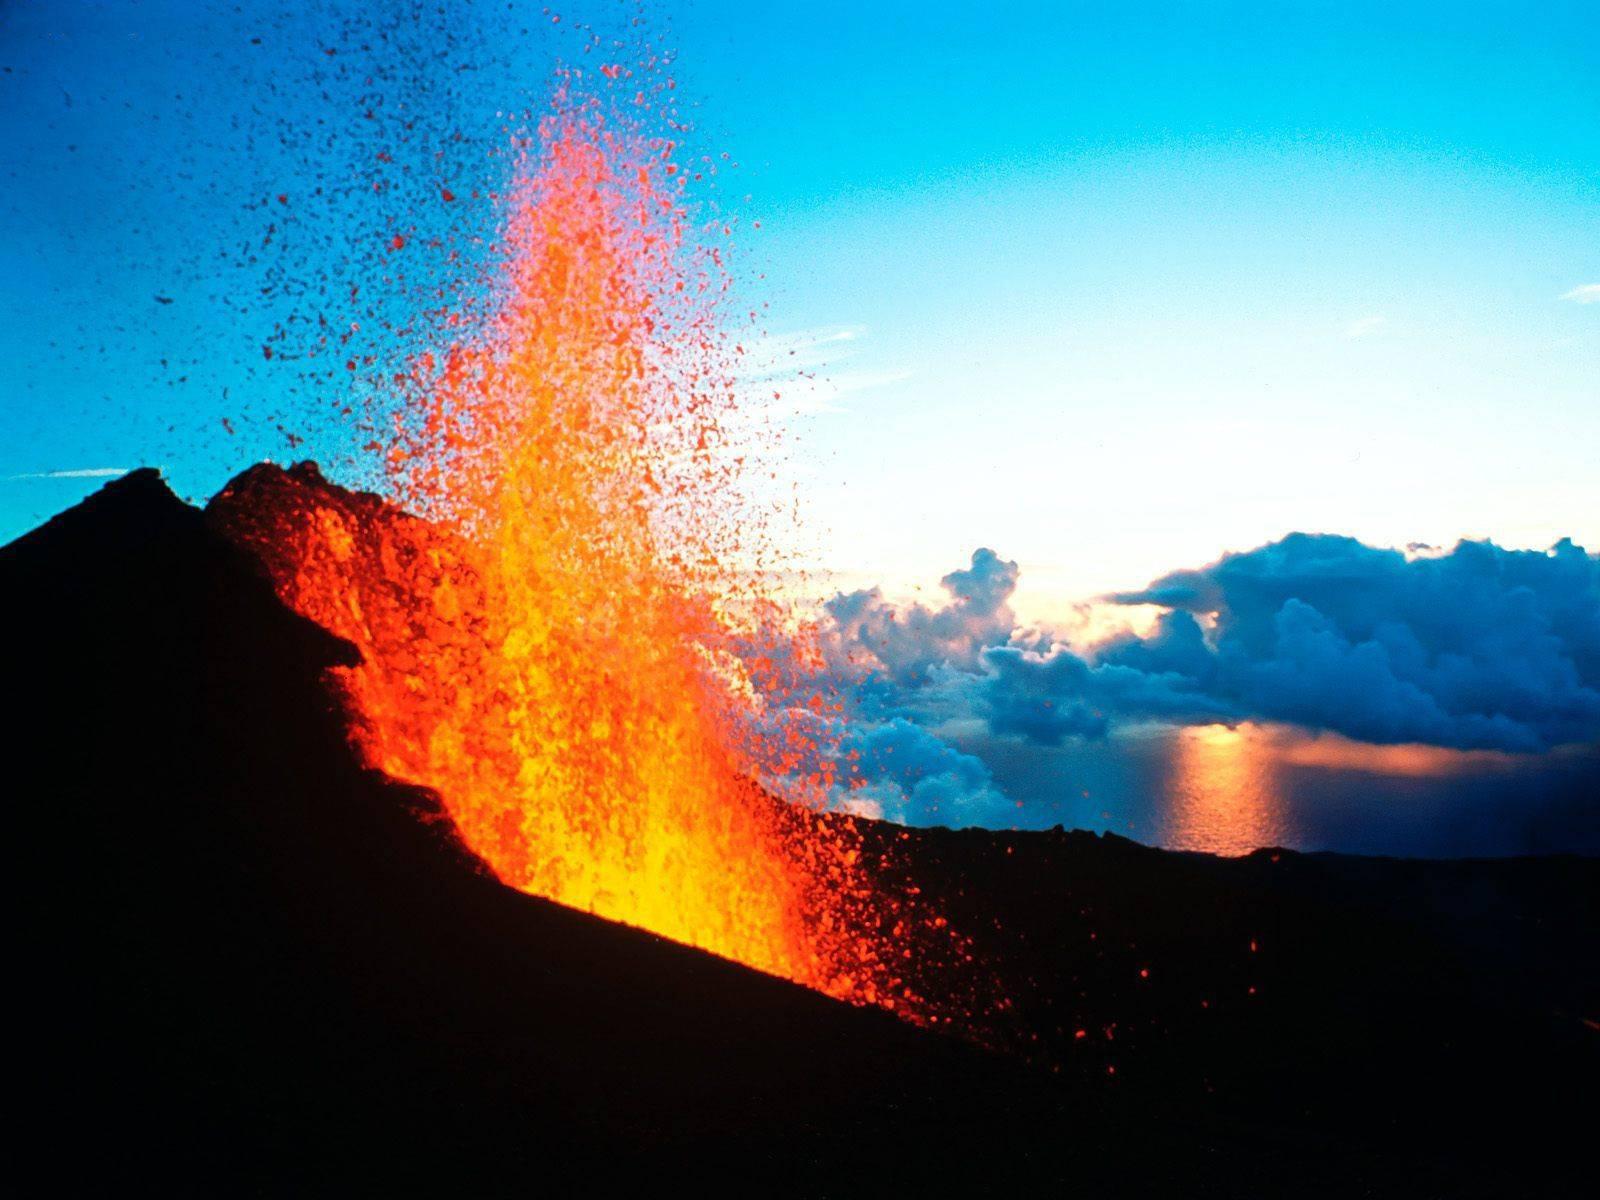 Piton_de_la_Fournaise_Reunion_Island